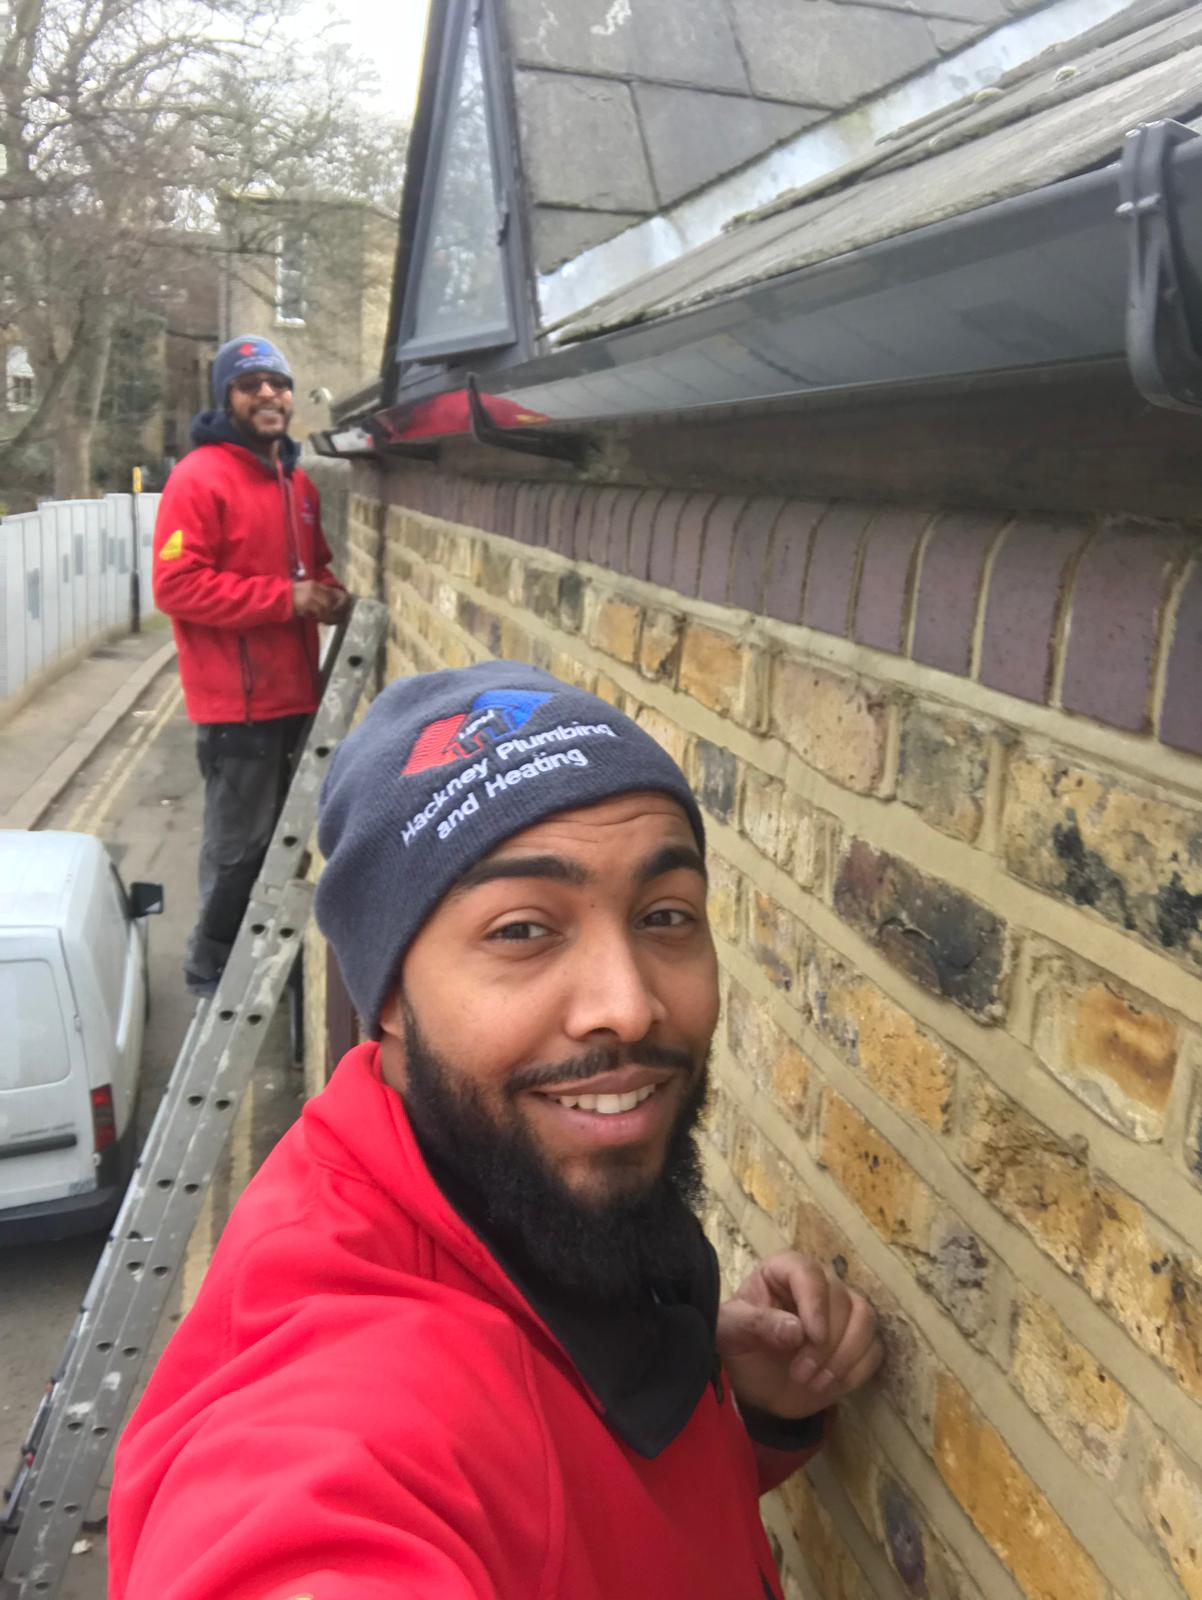 Hackney plumbing and heating